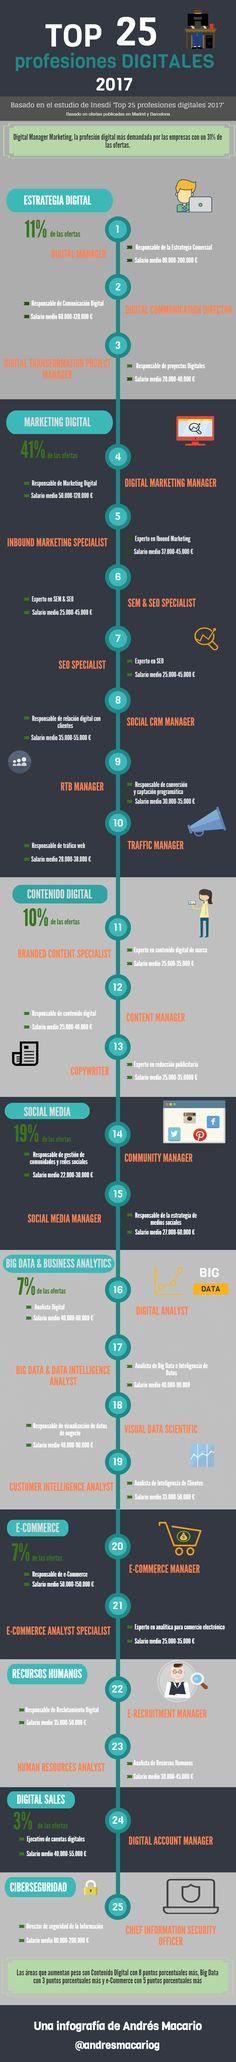 Top 25 Profesiones Digitales #infografia